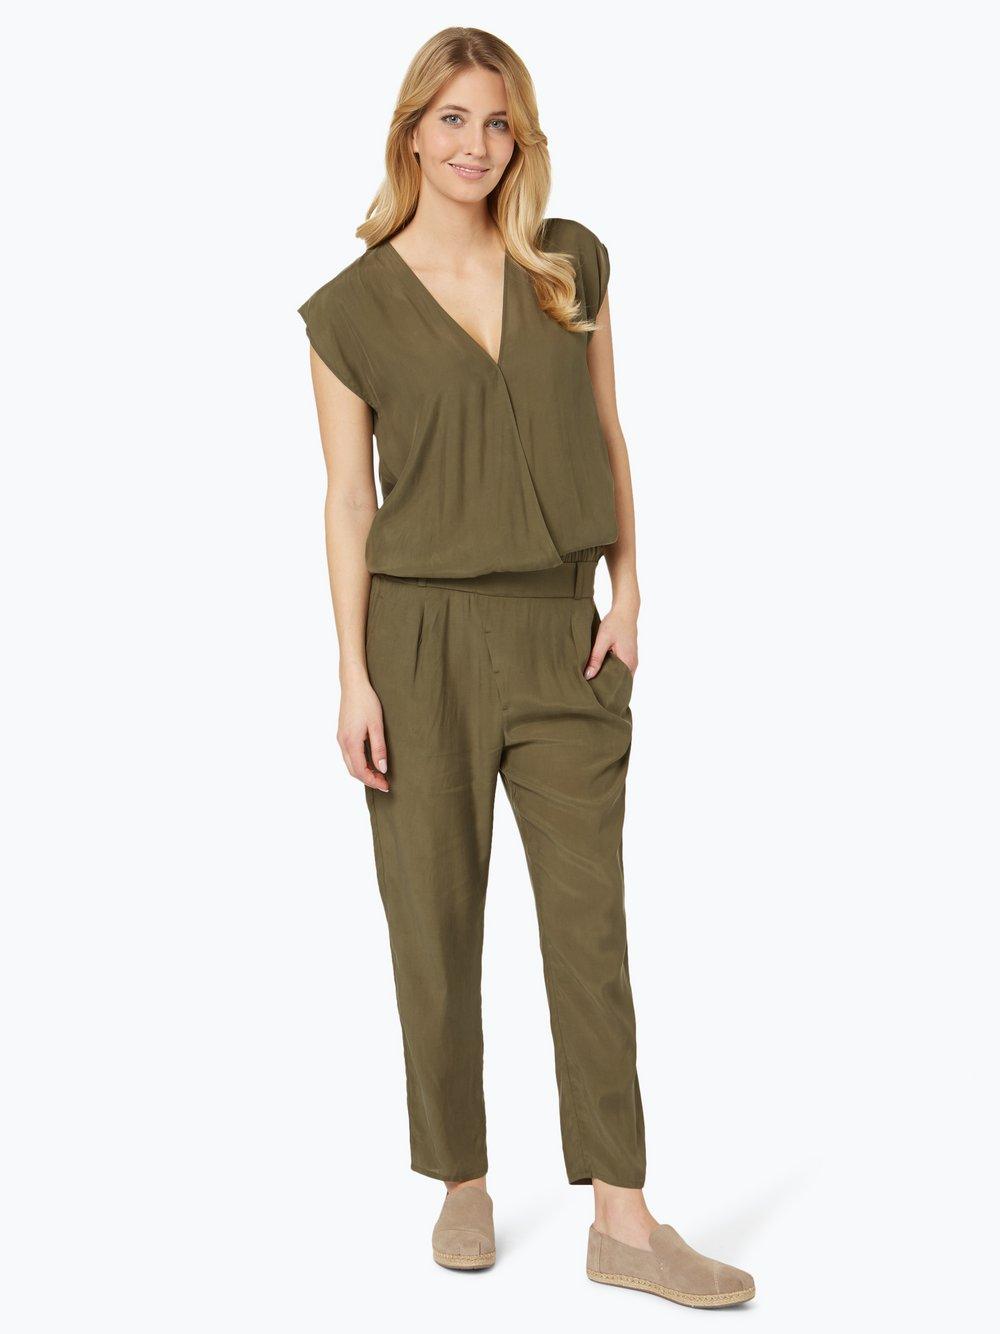 Drykorn Damen Jumpsuit - Tova oliv weiß uni online kaufen | VANGRAAF.COM